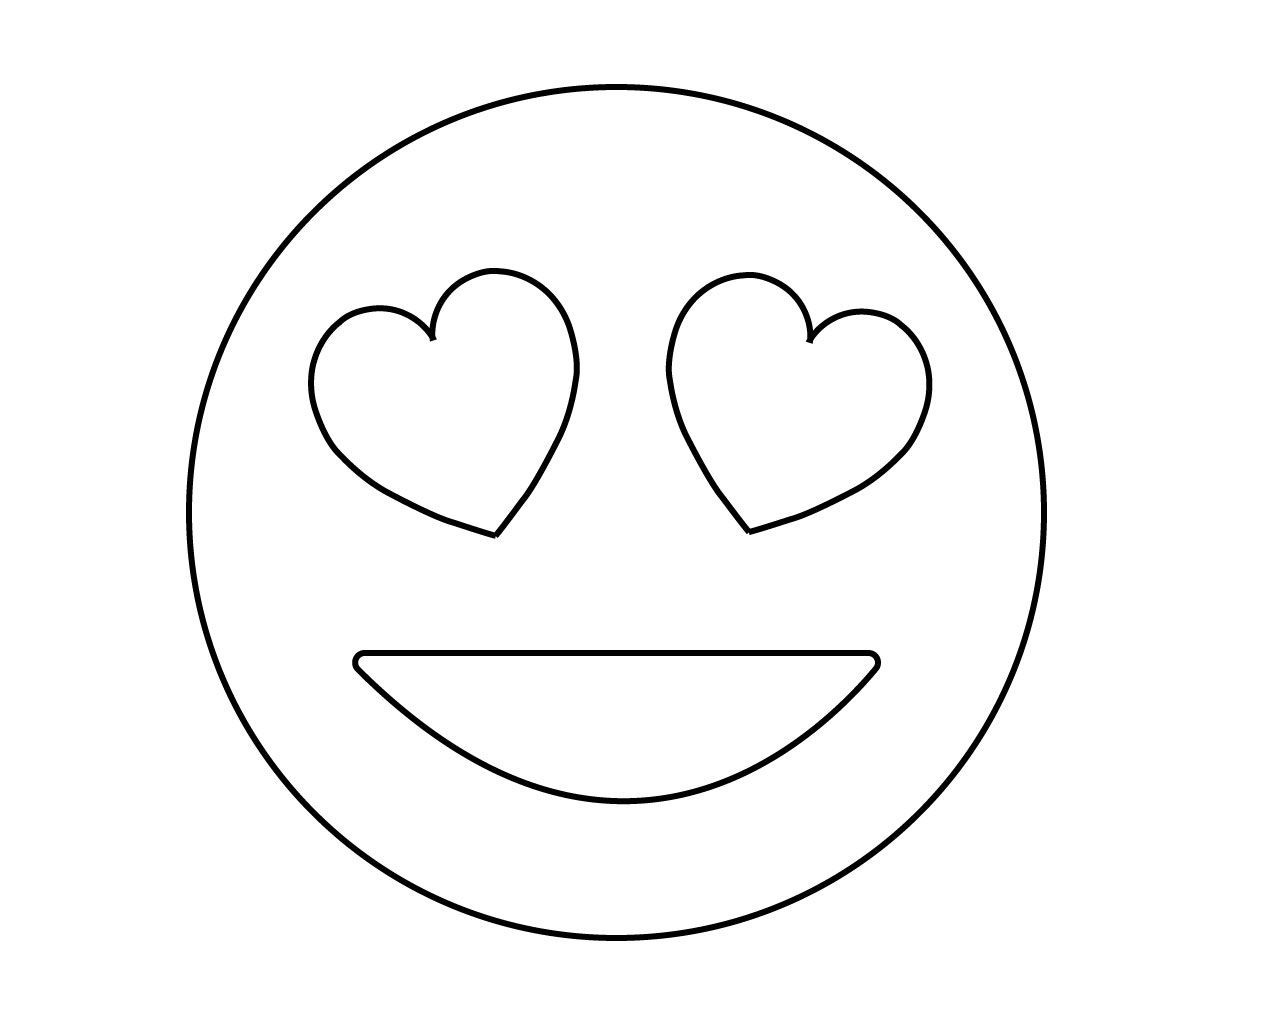 Birthday Emoji Coloring Pages Emoji Coloring Pages Love Coloring Pages Coloring Pages